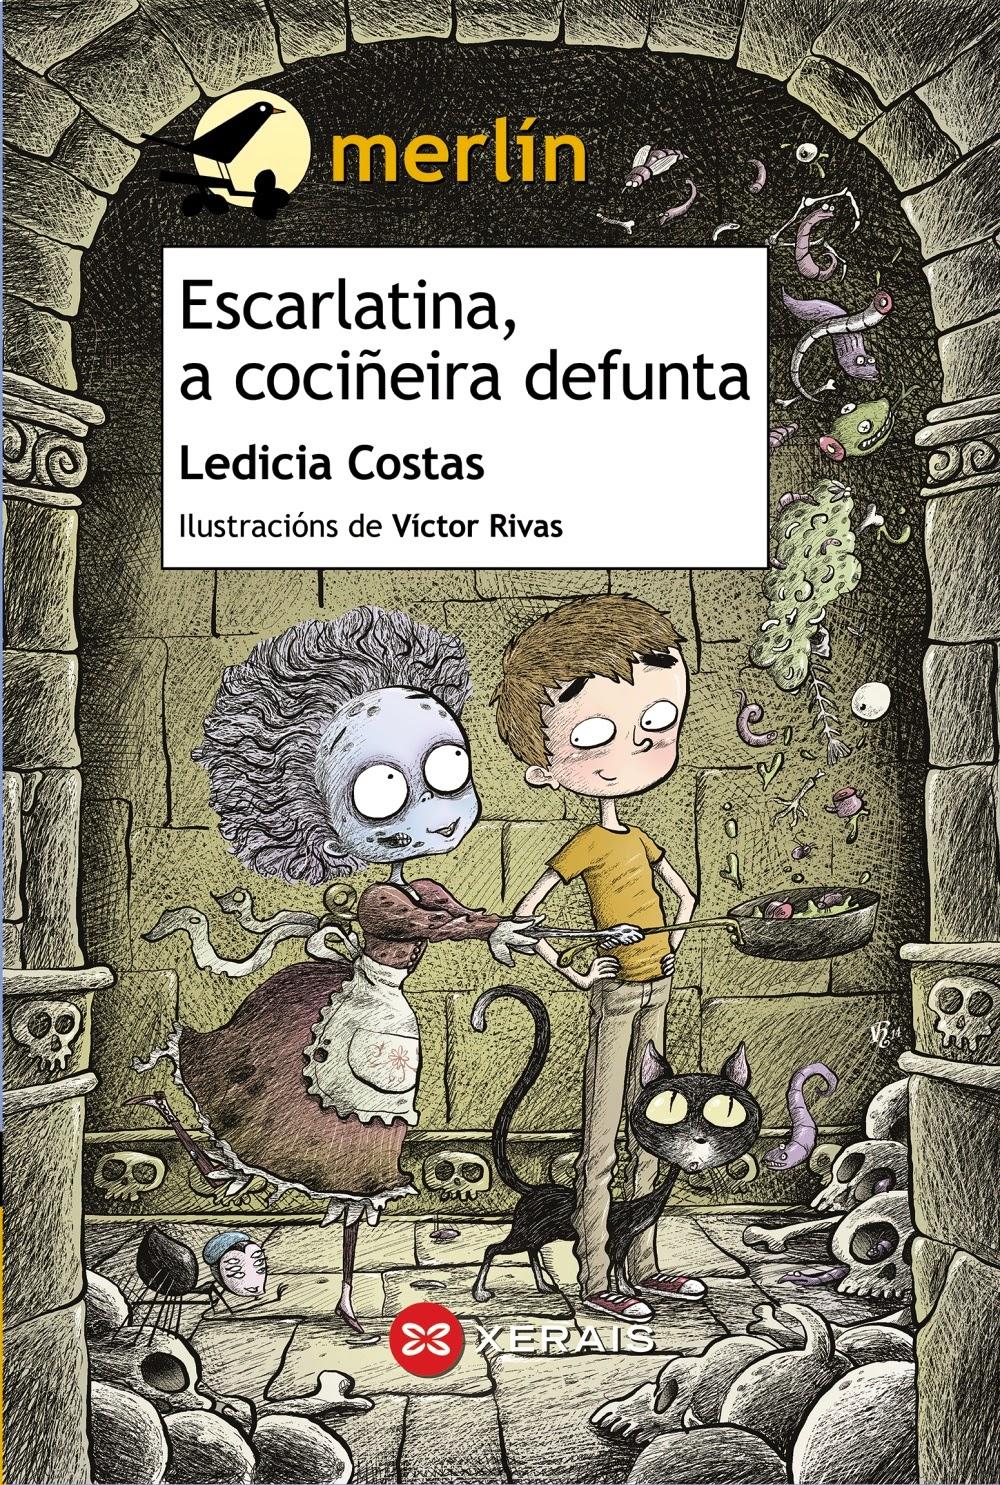 http://www.xerais.es/libro.php?id=3591495